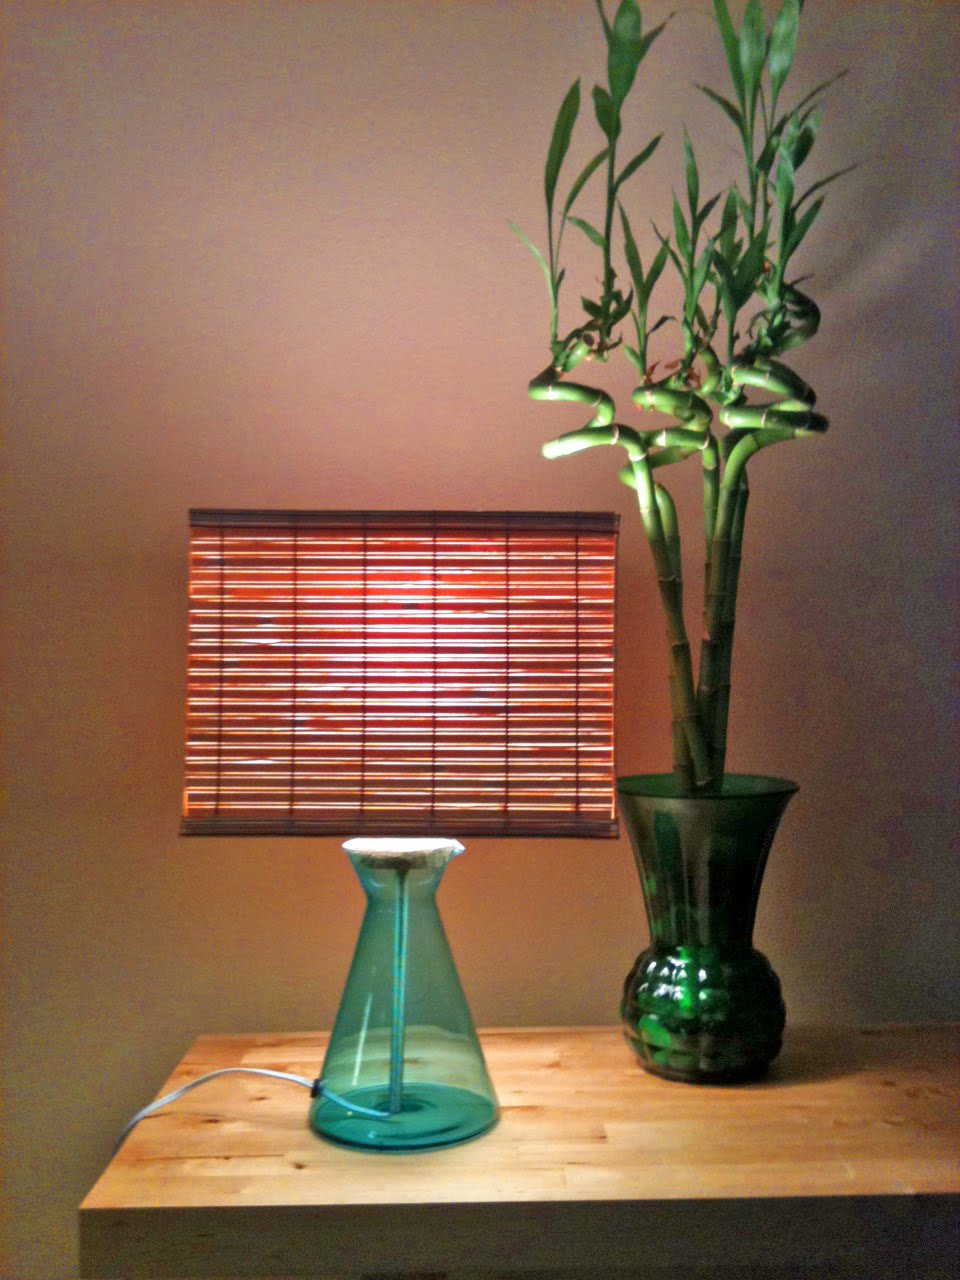 Ikea Beaker Vase Lamp Ikea Hackers